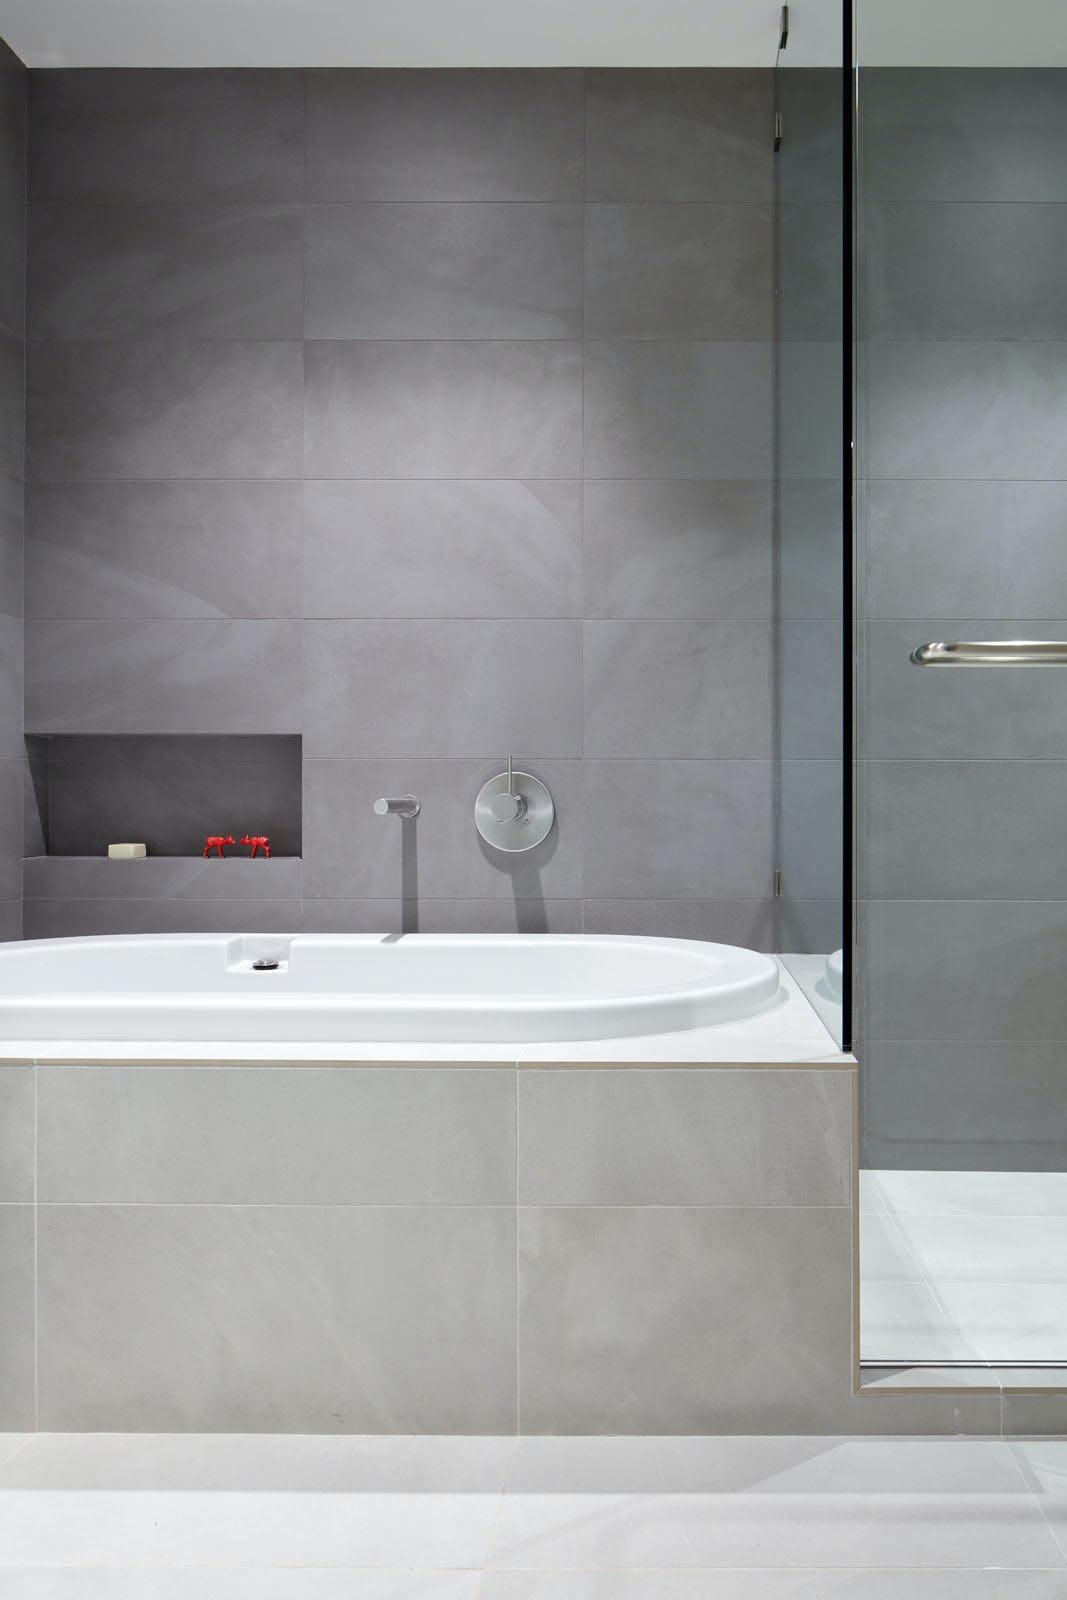 Builtform construction 441tamresidence detail bath tub modern tile smaller